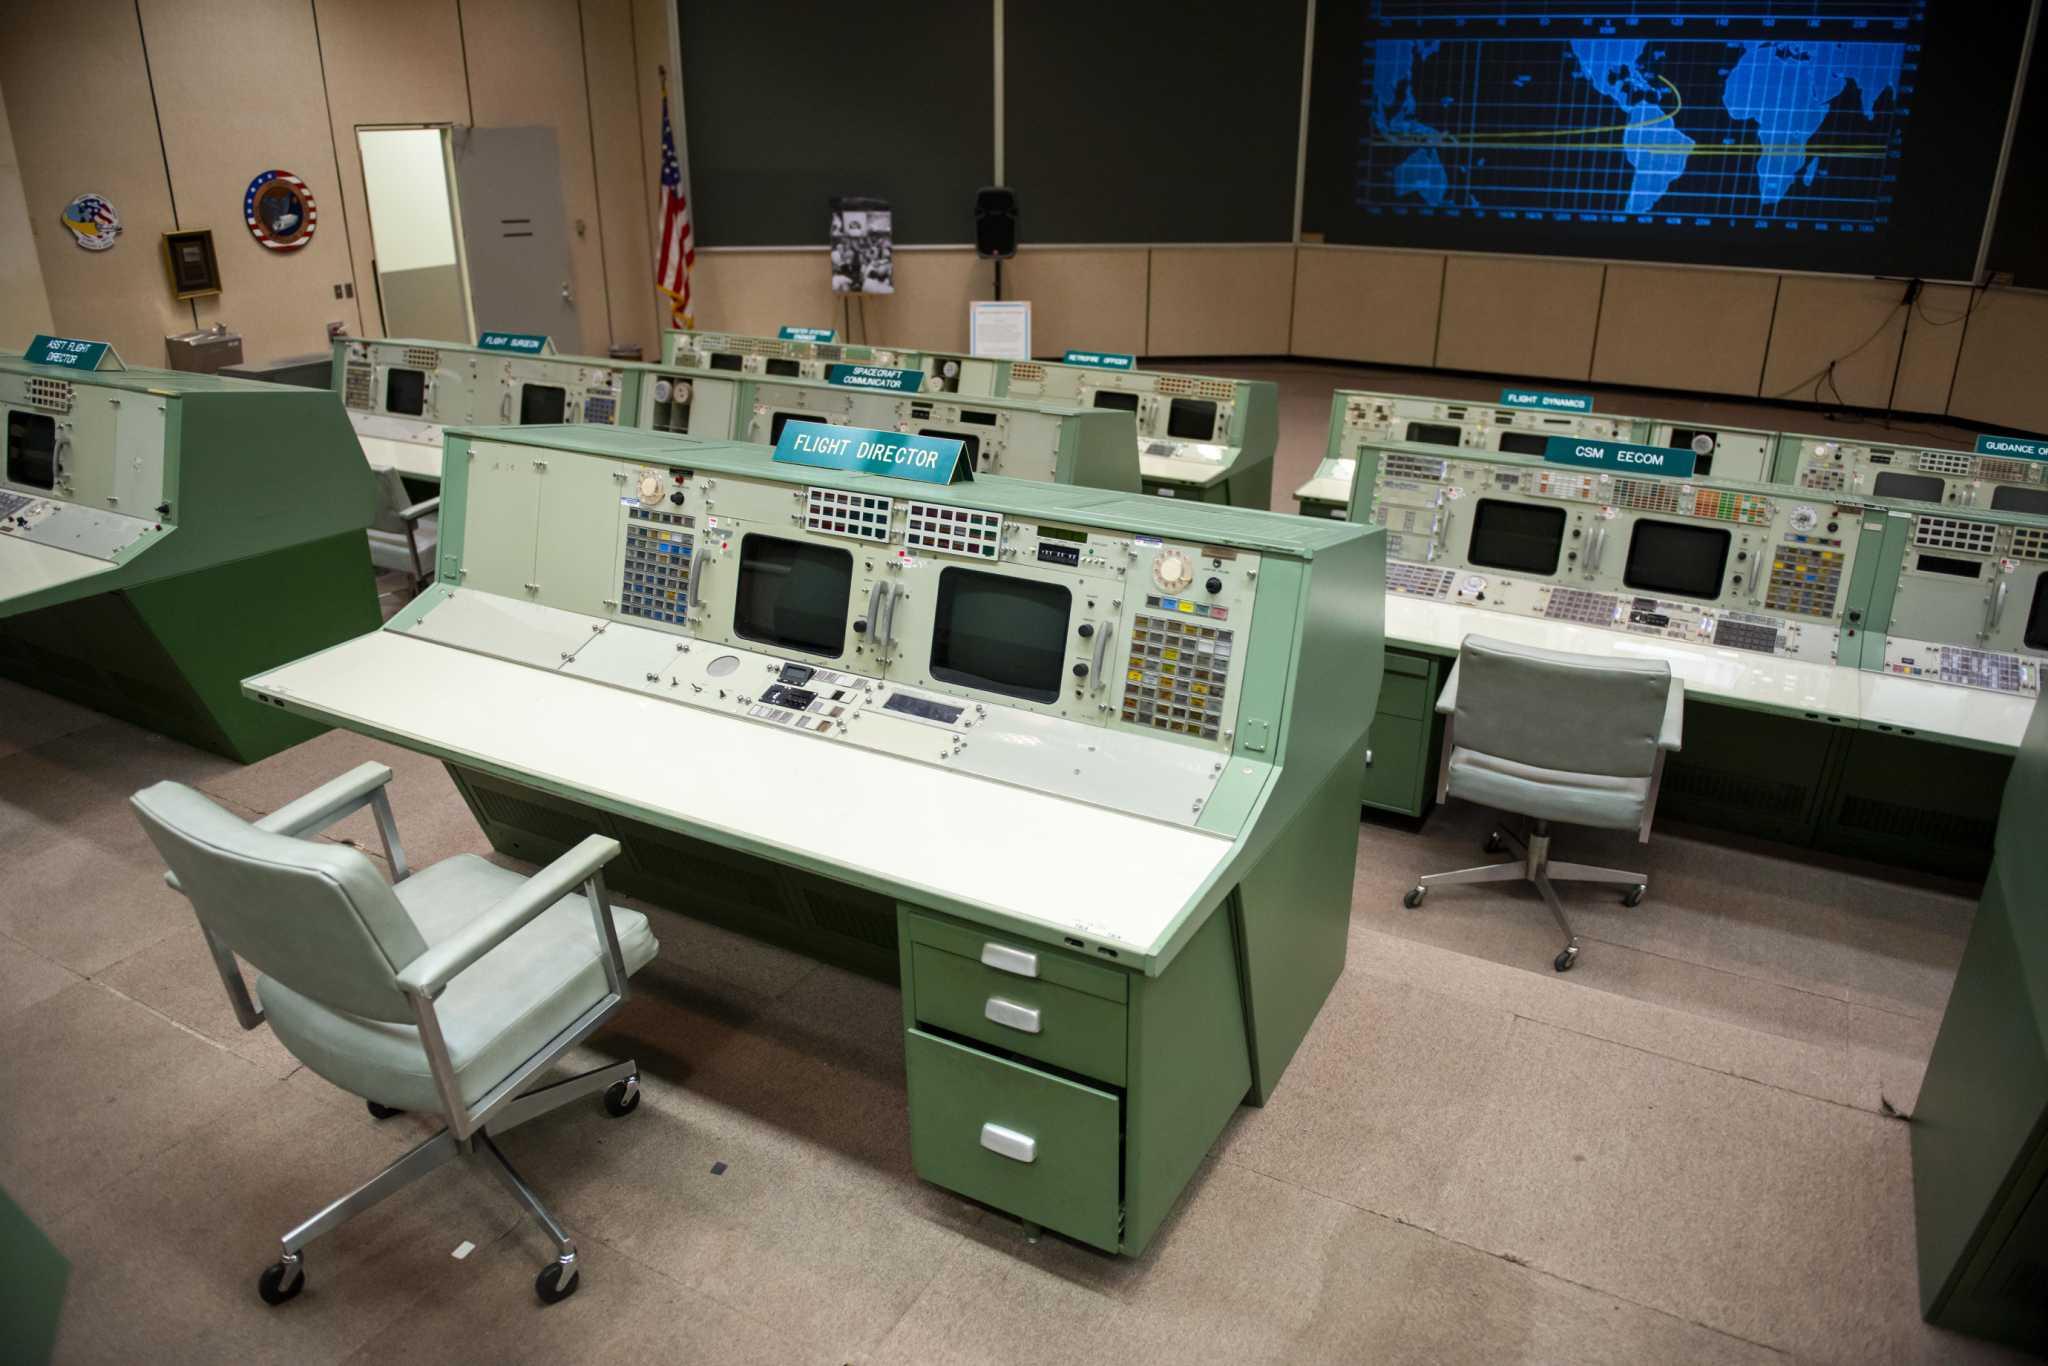 Mission Control restoration wins award